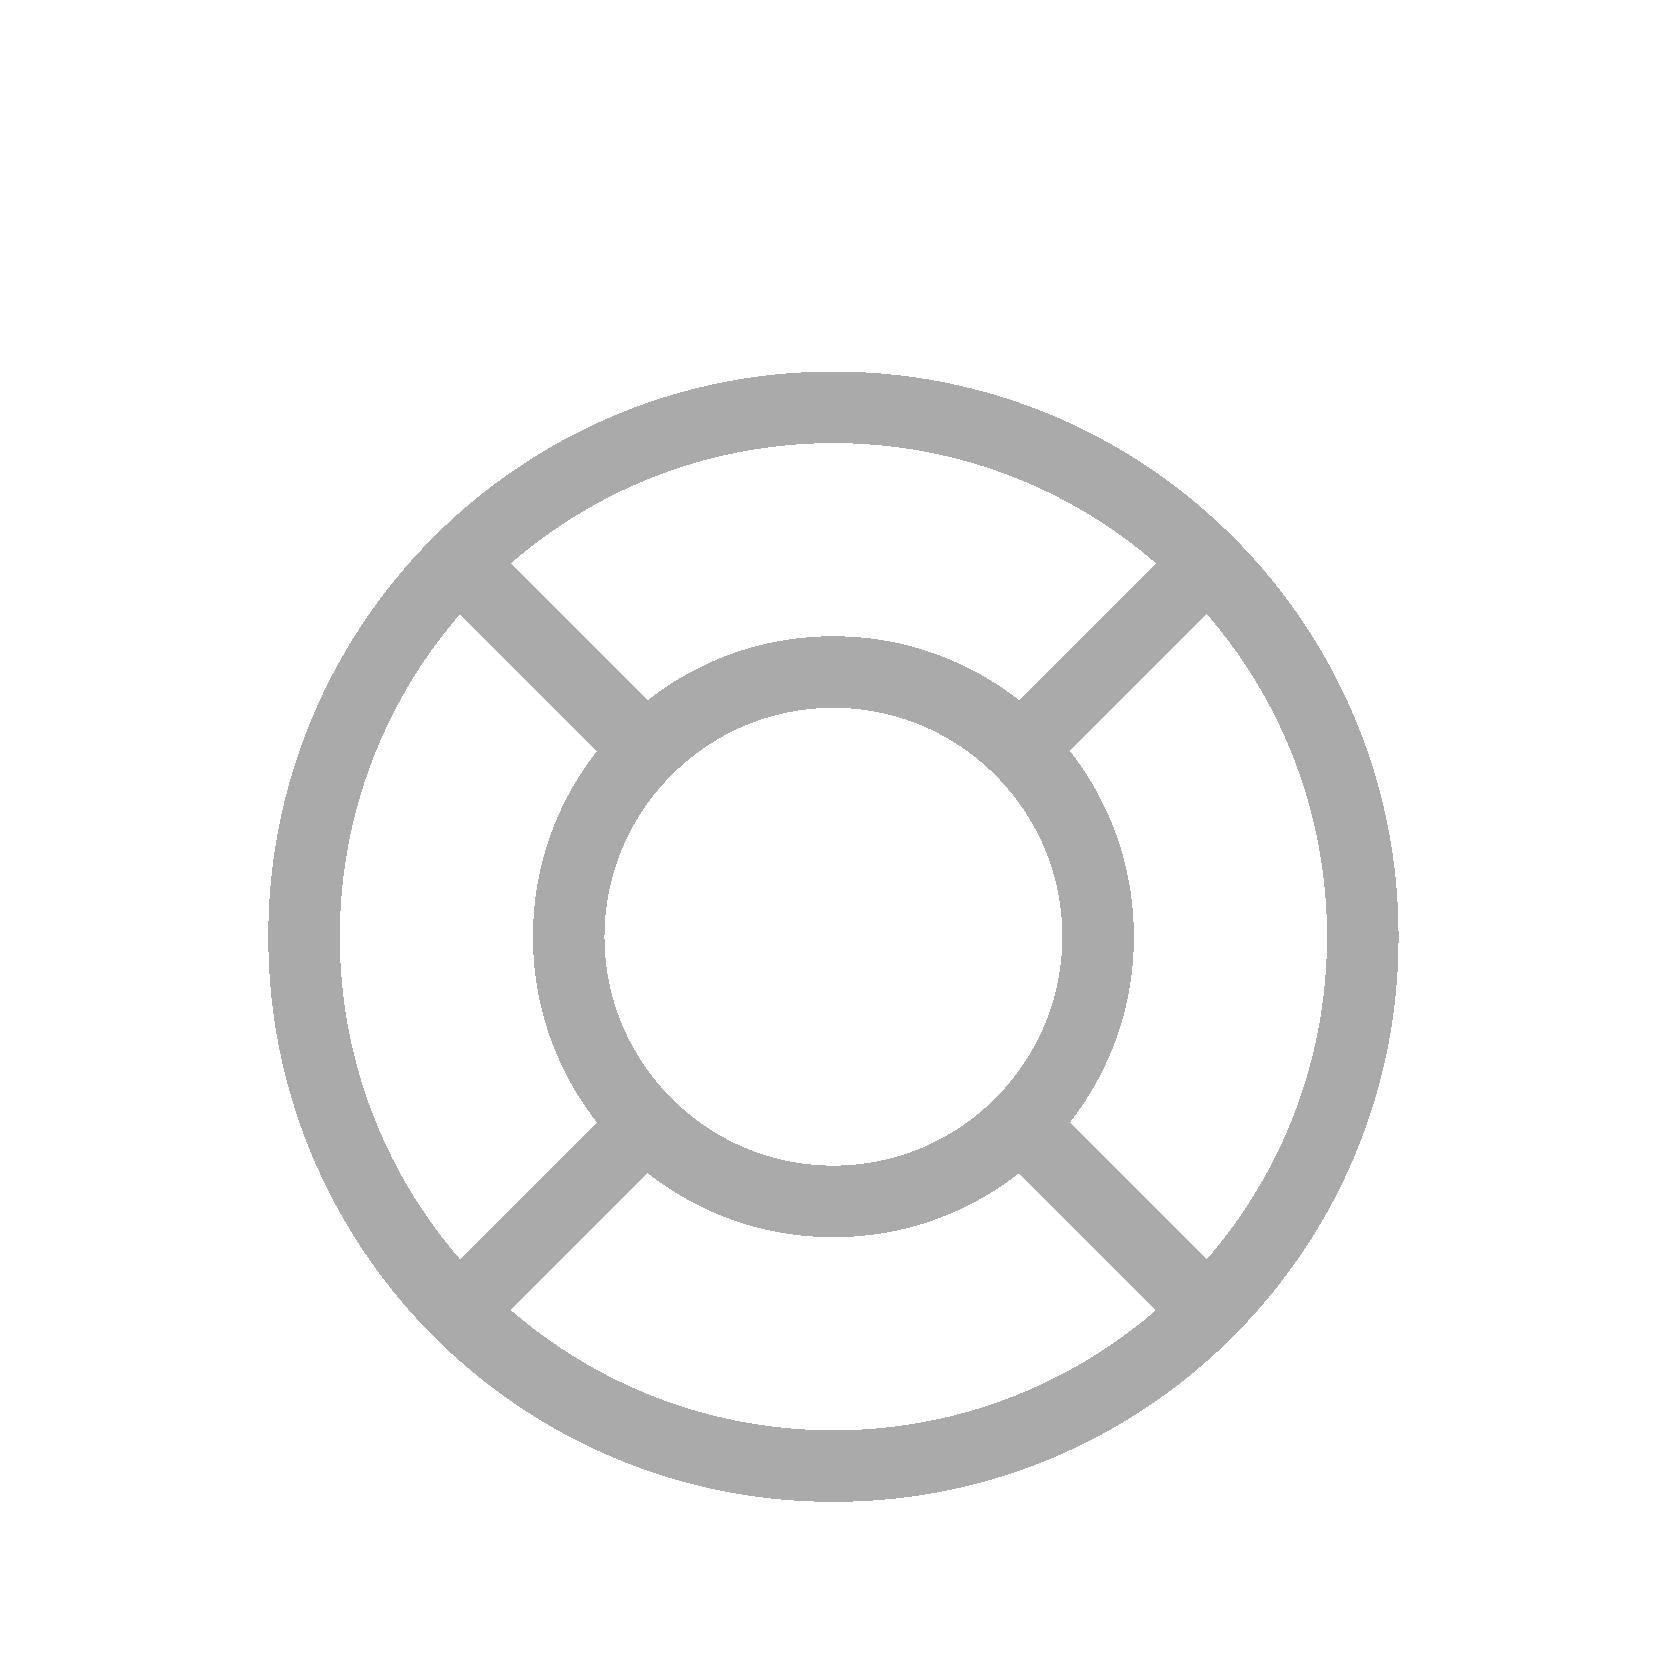 icon-mission-based